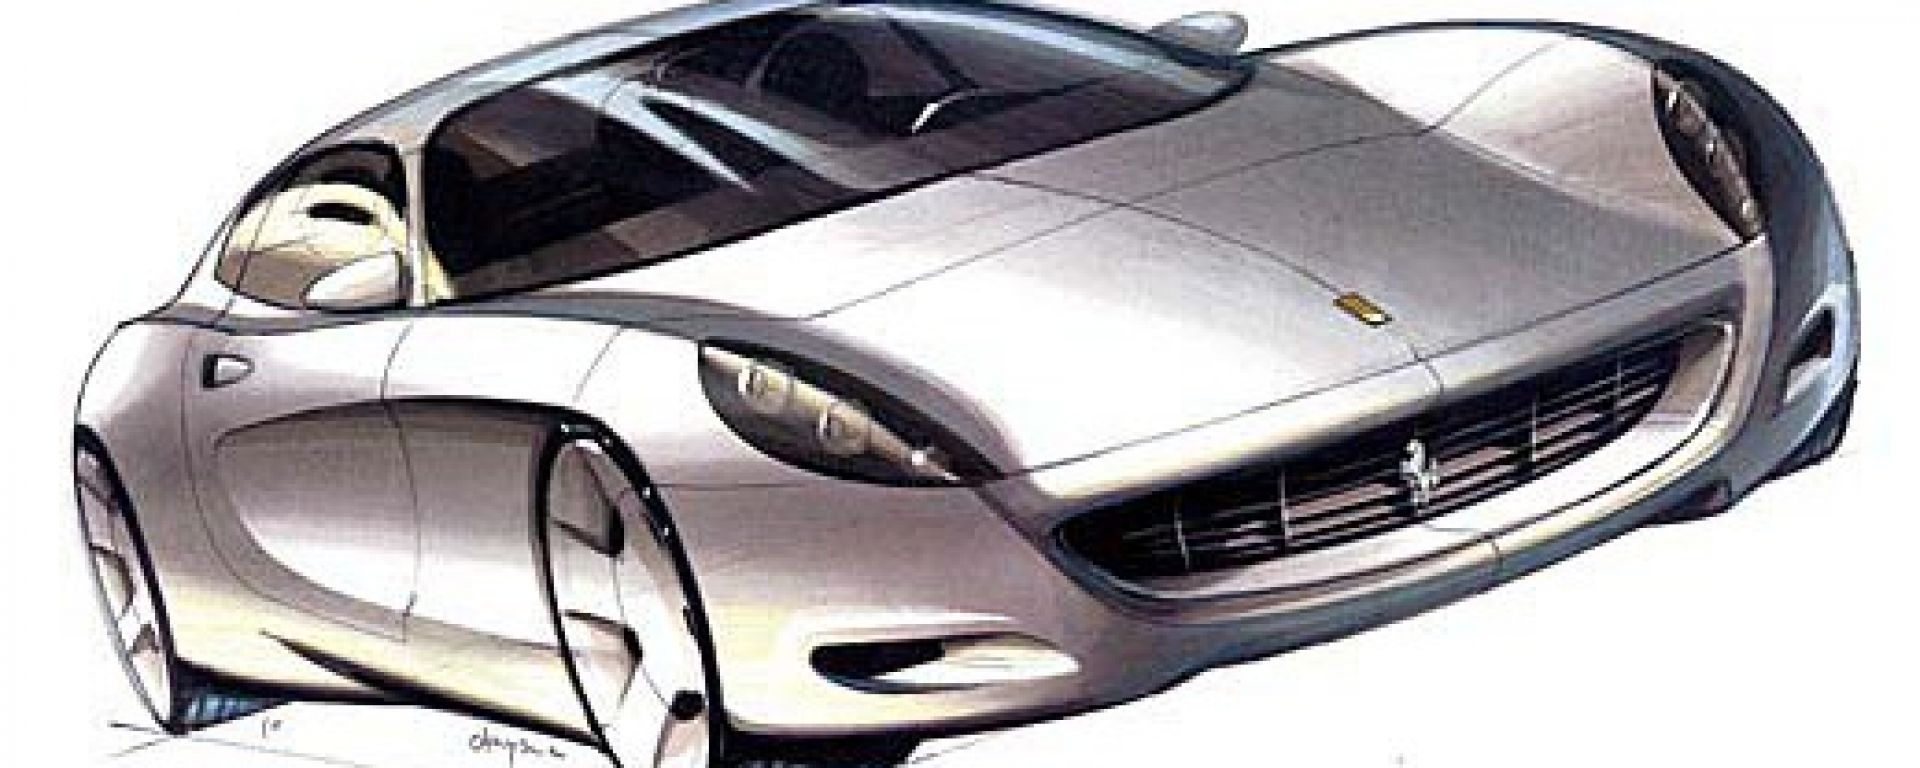 Anteprima:Nuova Ferrari 456